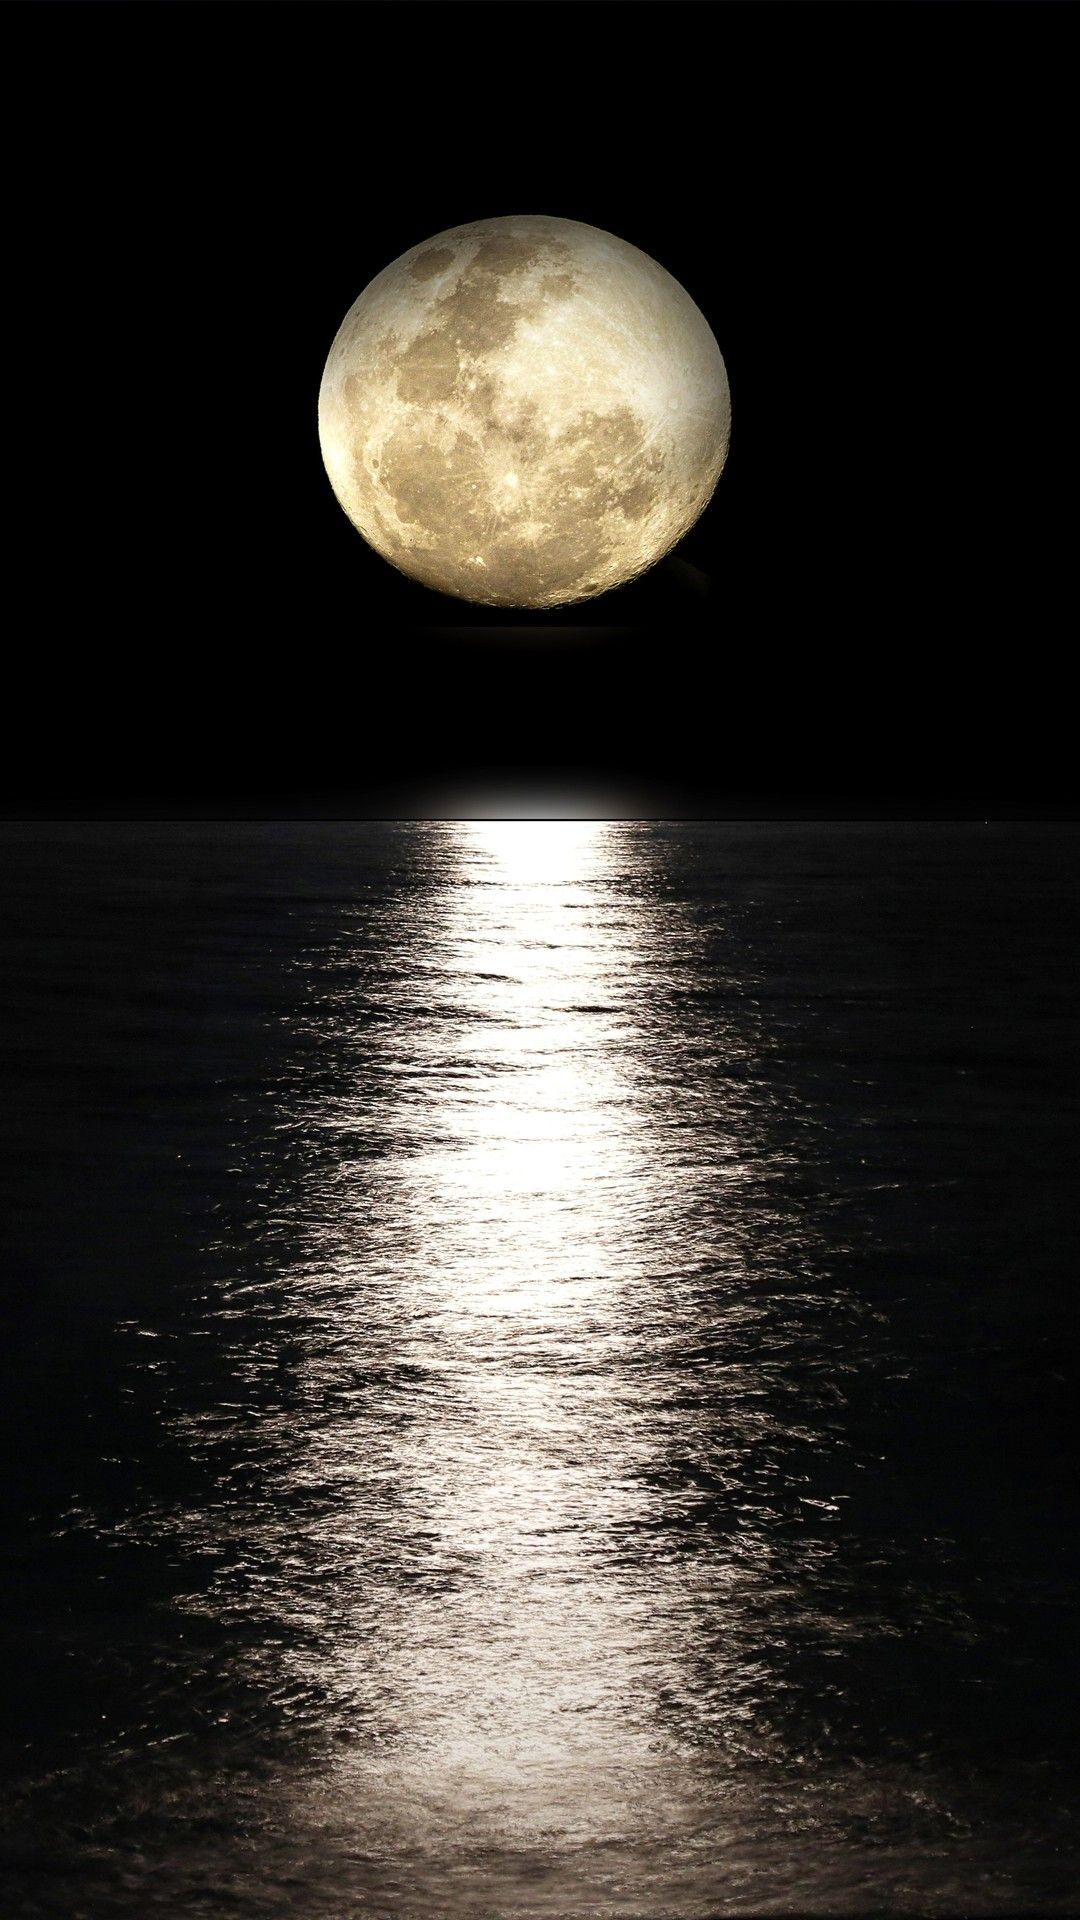 Dark Night Moon Reflection In Sea 5k In 1080x1920 Resolution Moon Photography Shoot The Moon Moon Sea Hd wallpaper sea moon water reflection